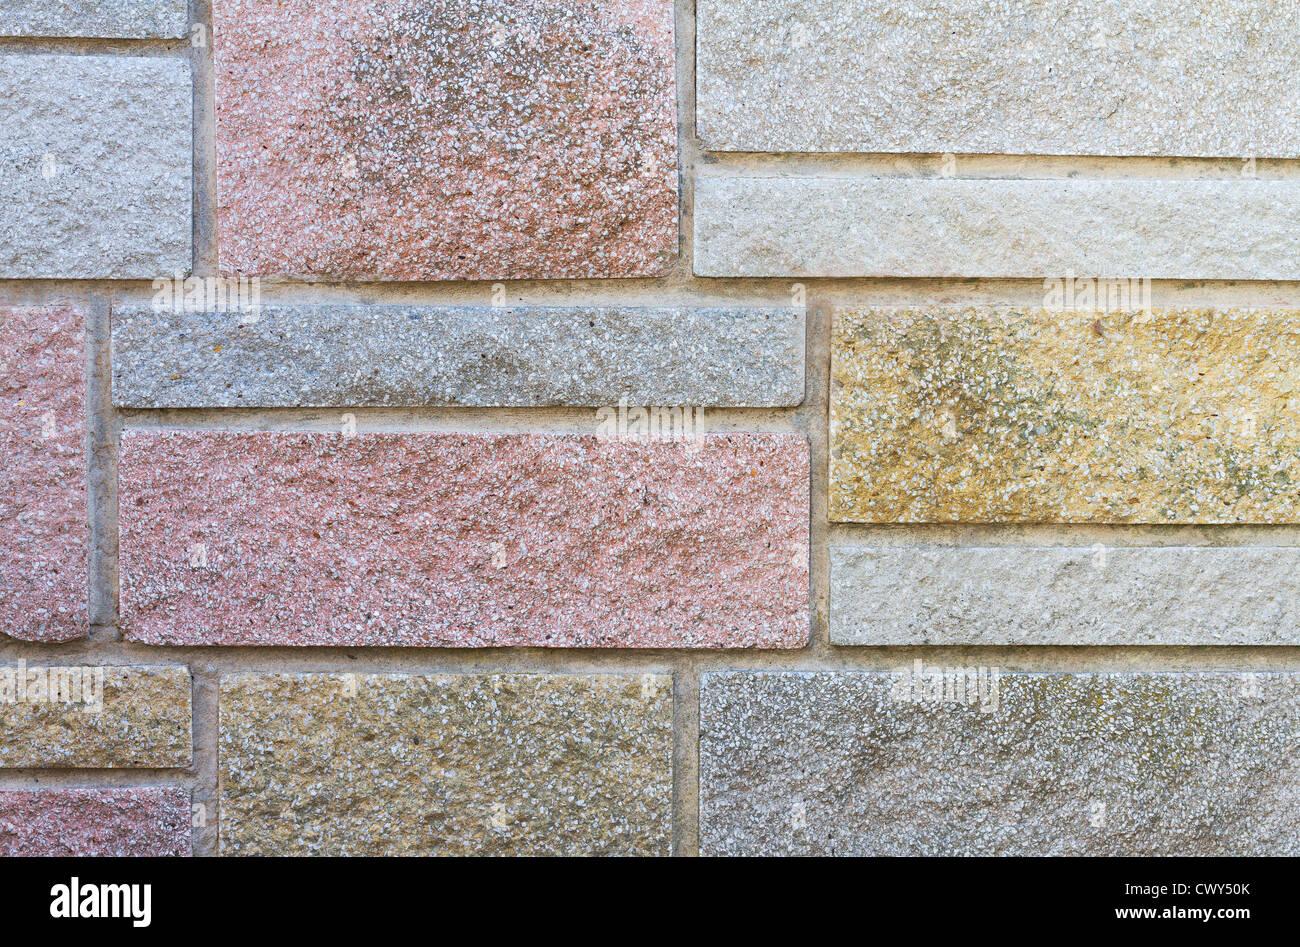 Decorative Stone Cladding On House Wall Stock Photo